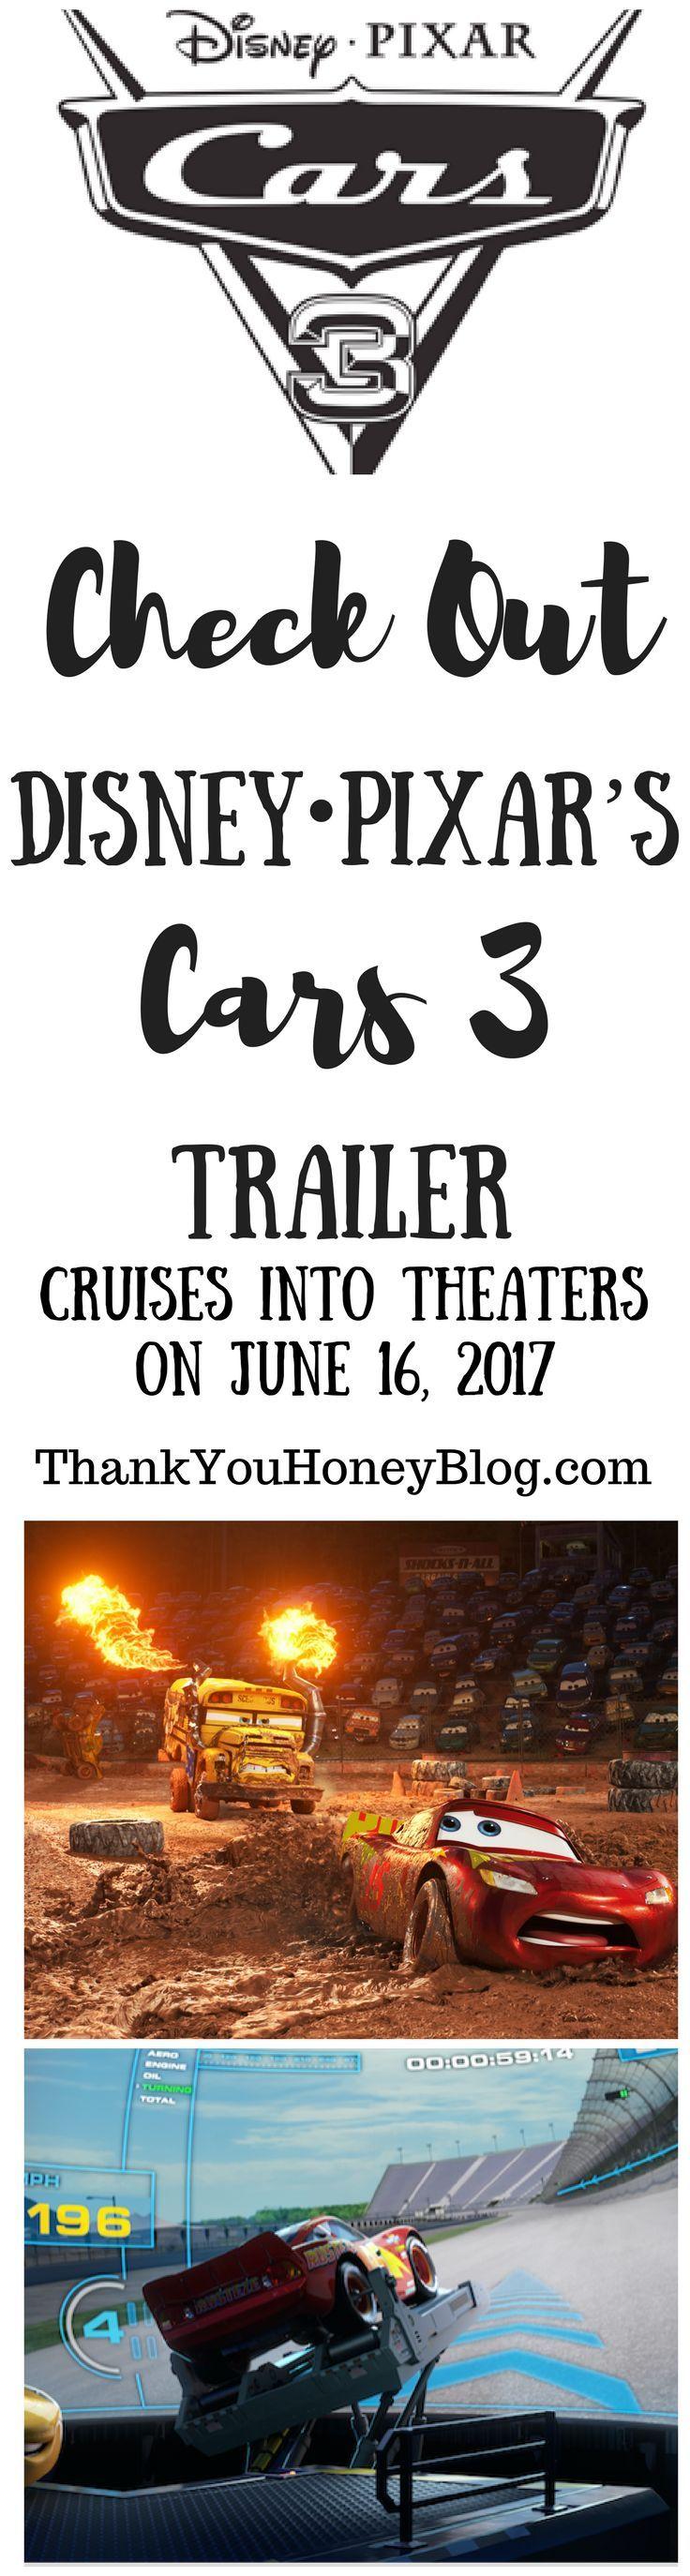 Best 25+ Cars 3 trailer ideas on Pinterest | Disney cars 3, Cars 3 ...